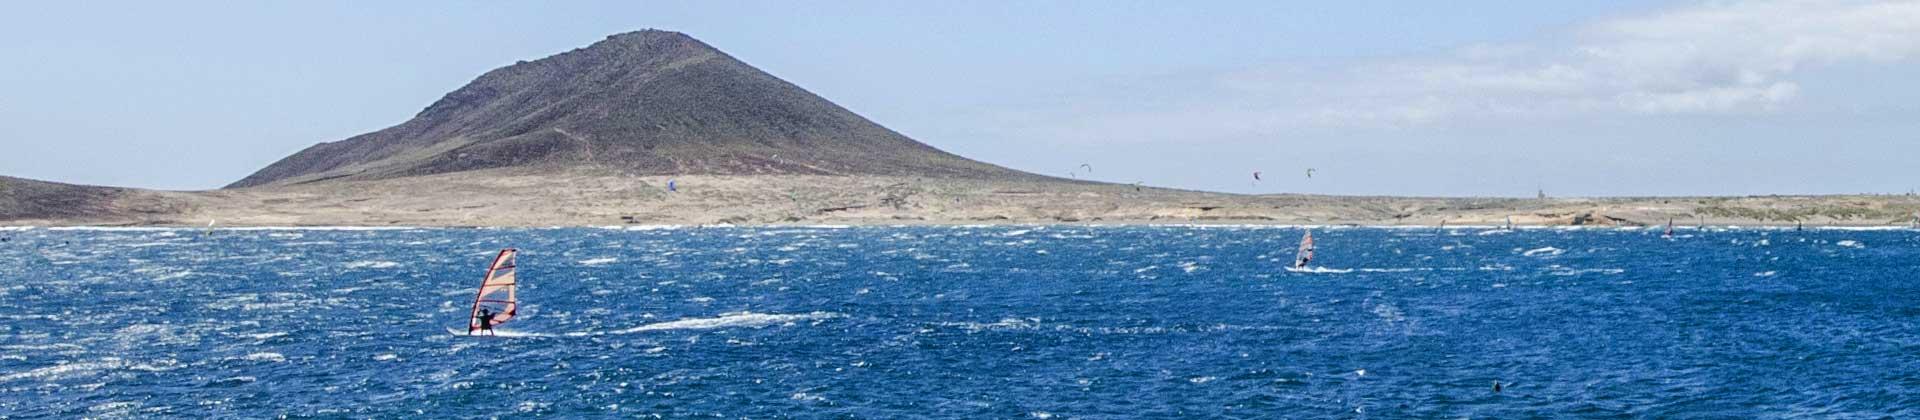 https://www.goodmorningtenerife.com/wp-content/uploads/2014/08/03_slide_windsurfing_GM_Tenerife.jpg